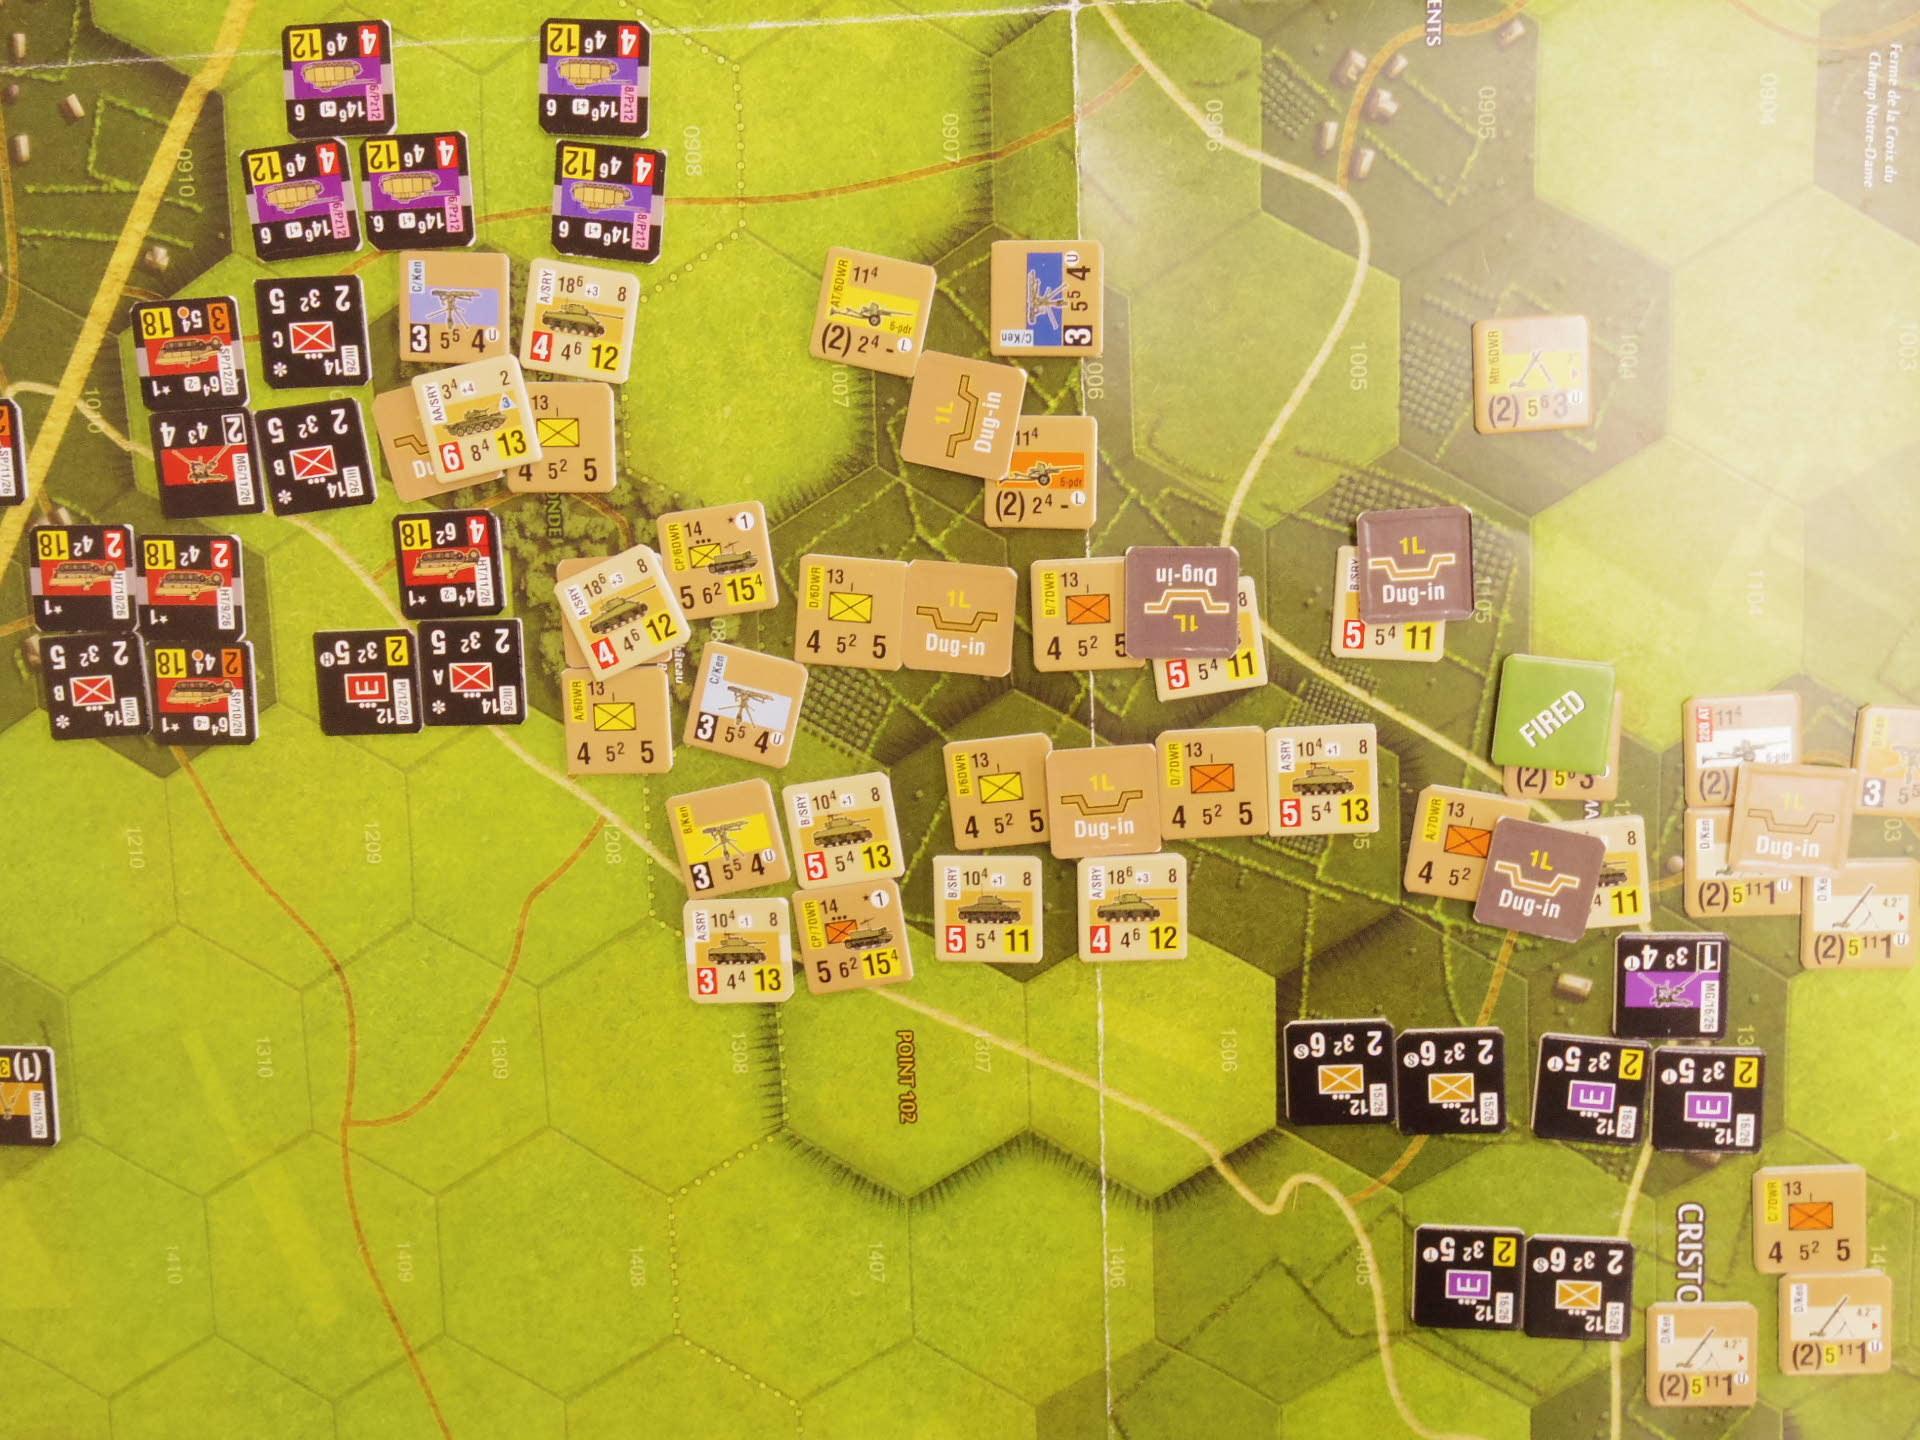 YSGA三月例会の様子その7〔(GMT)Operation Dauntlessシナリオ18.3「Heavy Counterattack」 1944年6月18日14:00〜〕_b0173672_06531552.jpg